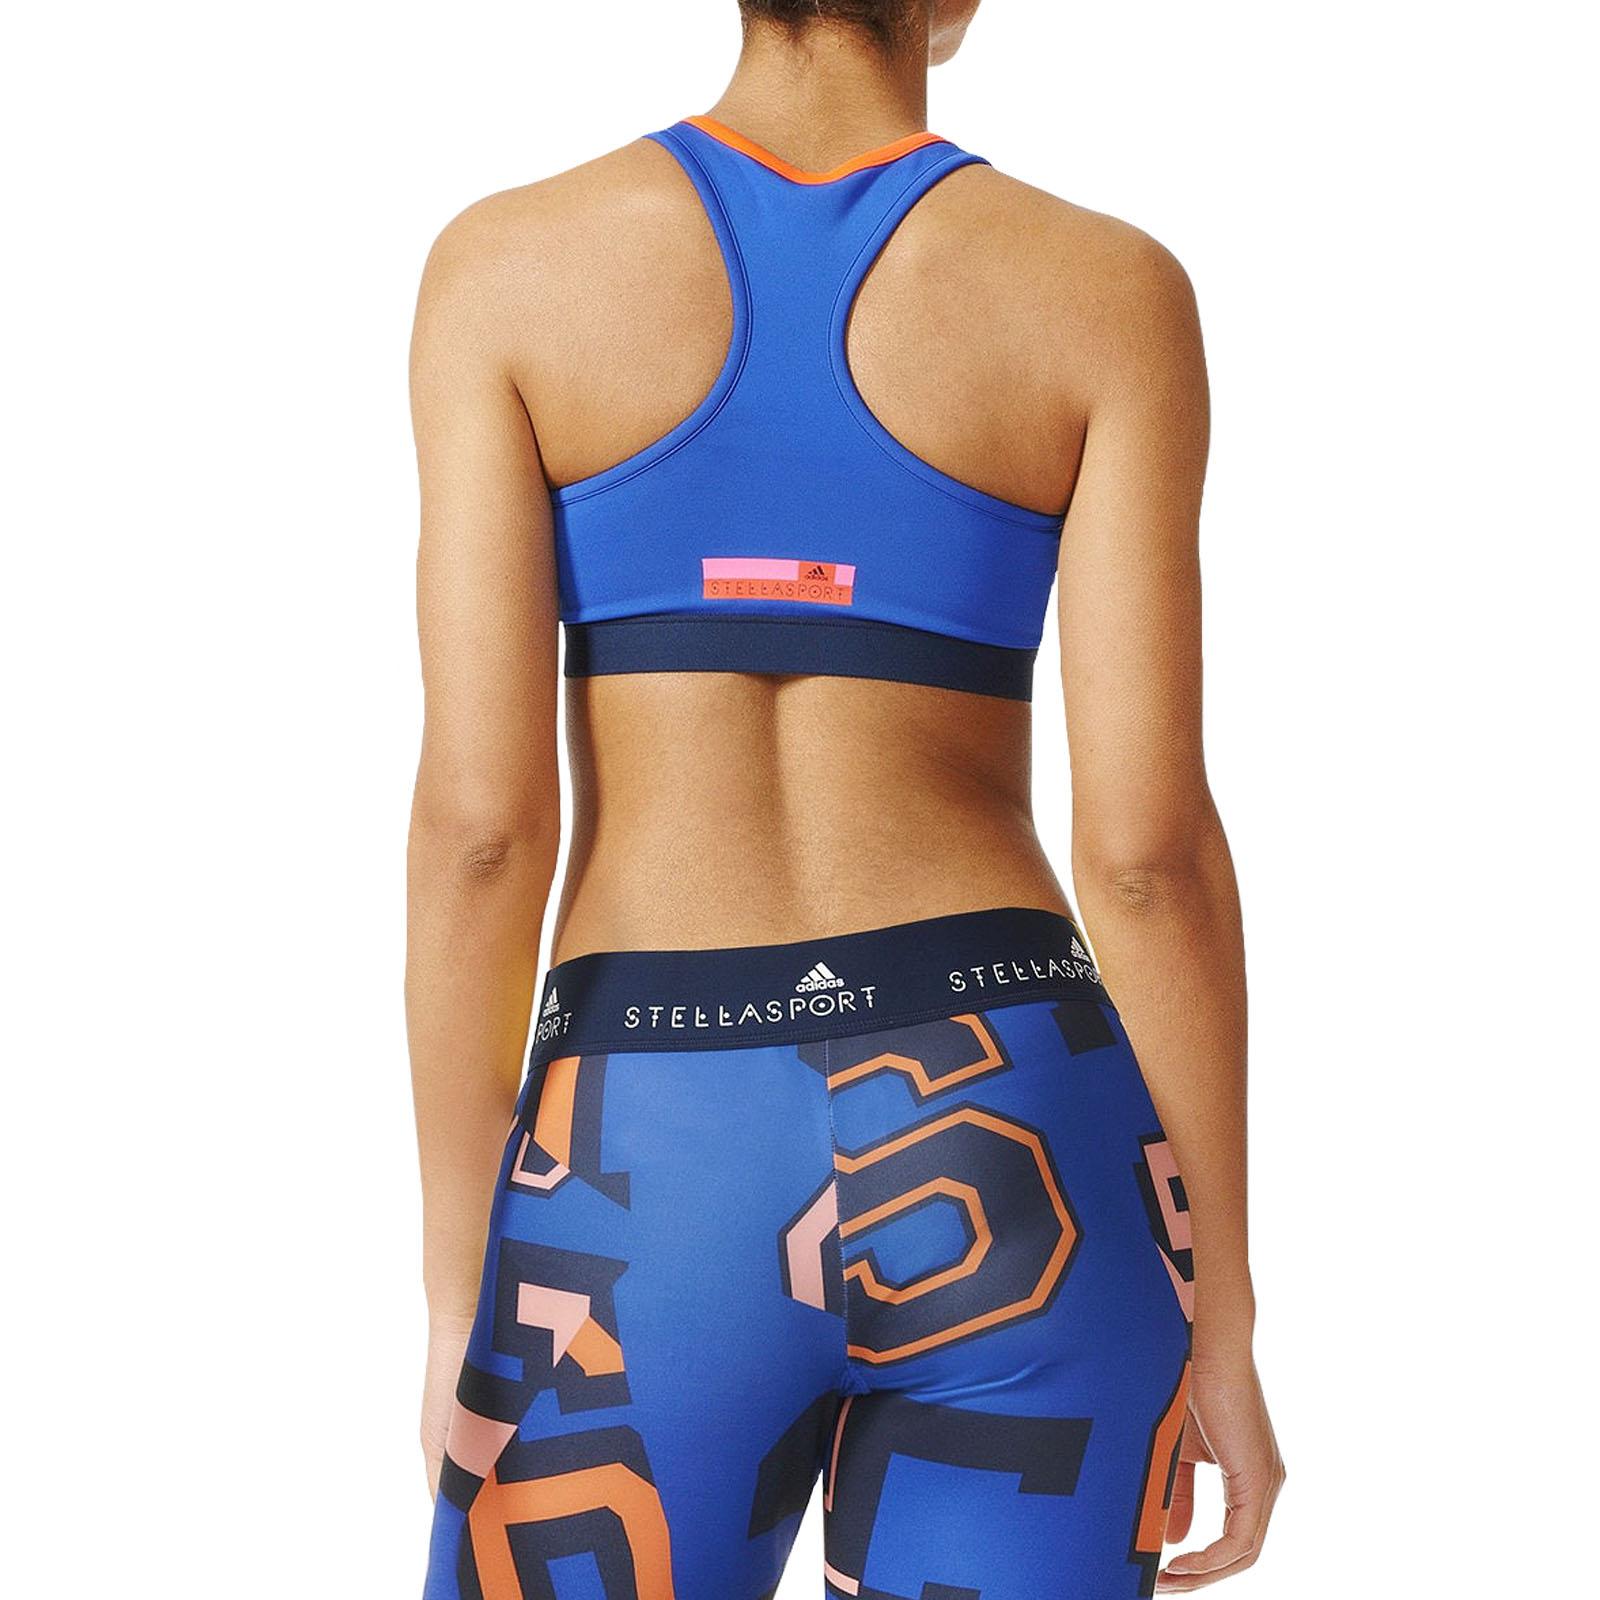 Jabot Gym Stellasport Ebay Femmes Adidas Climalite Performance wIBU7EnqX